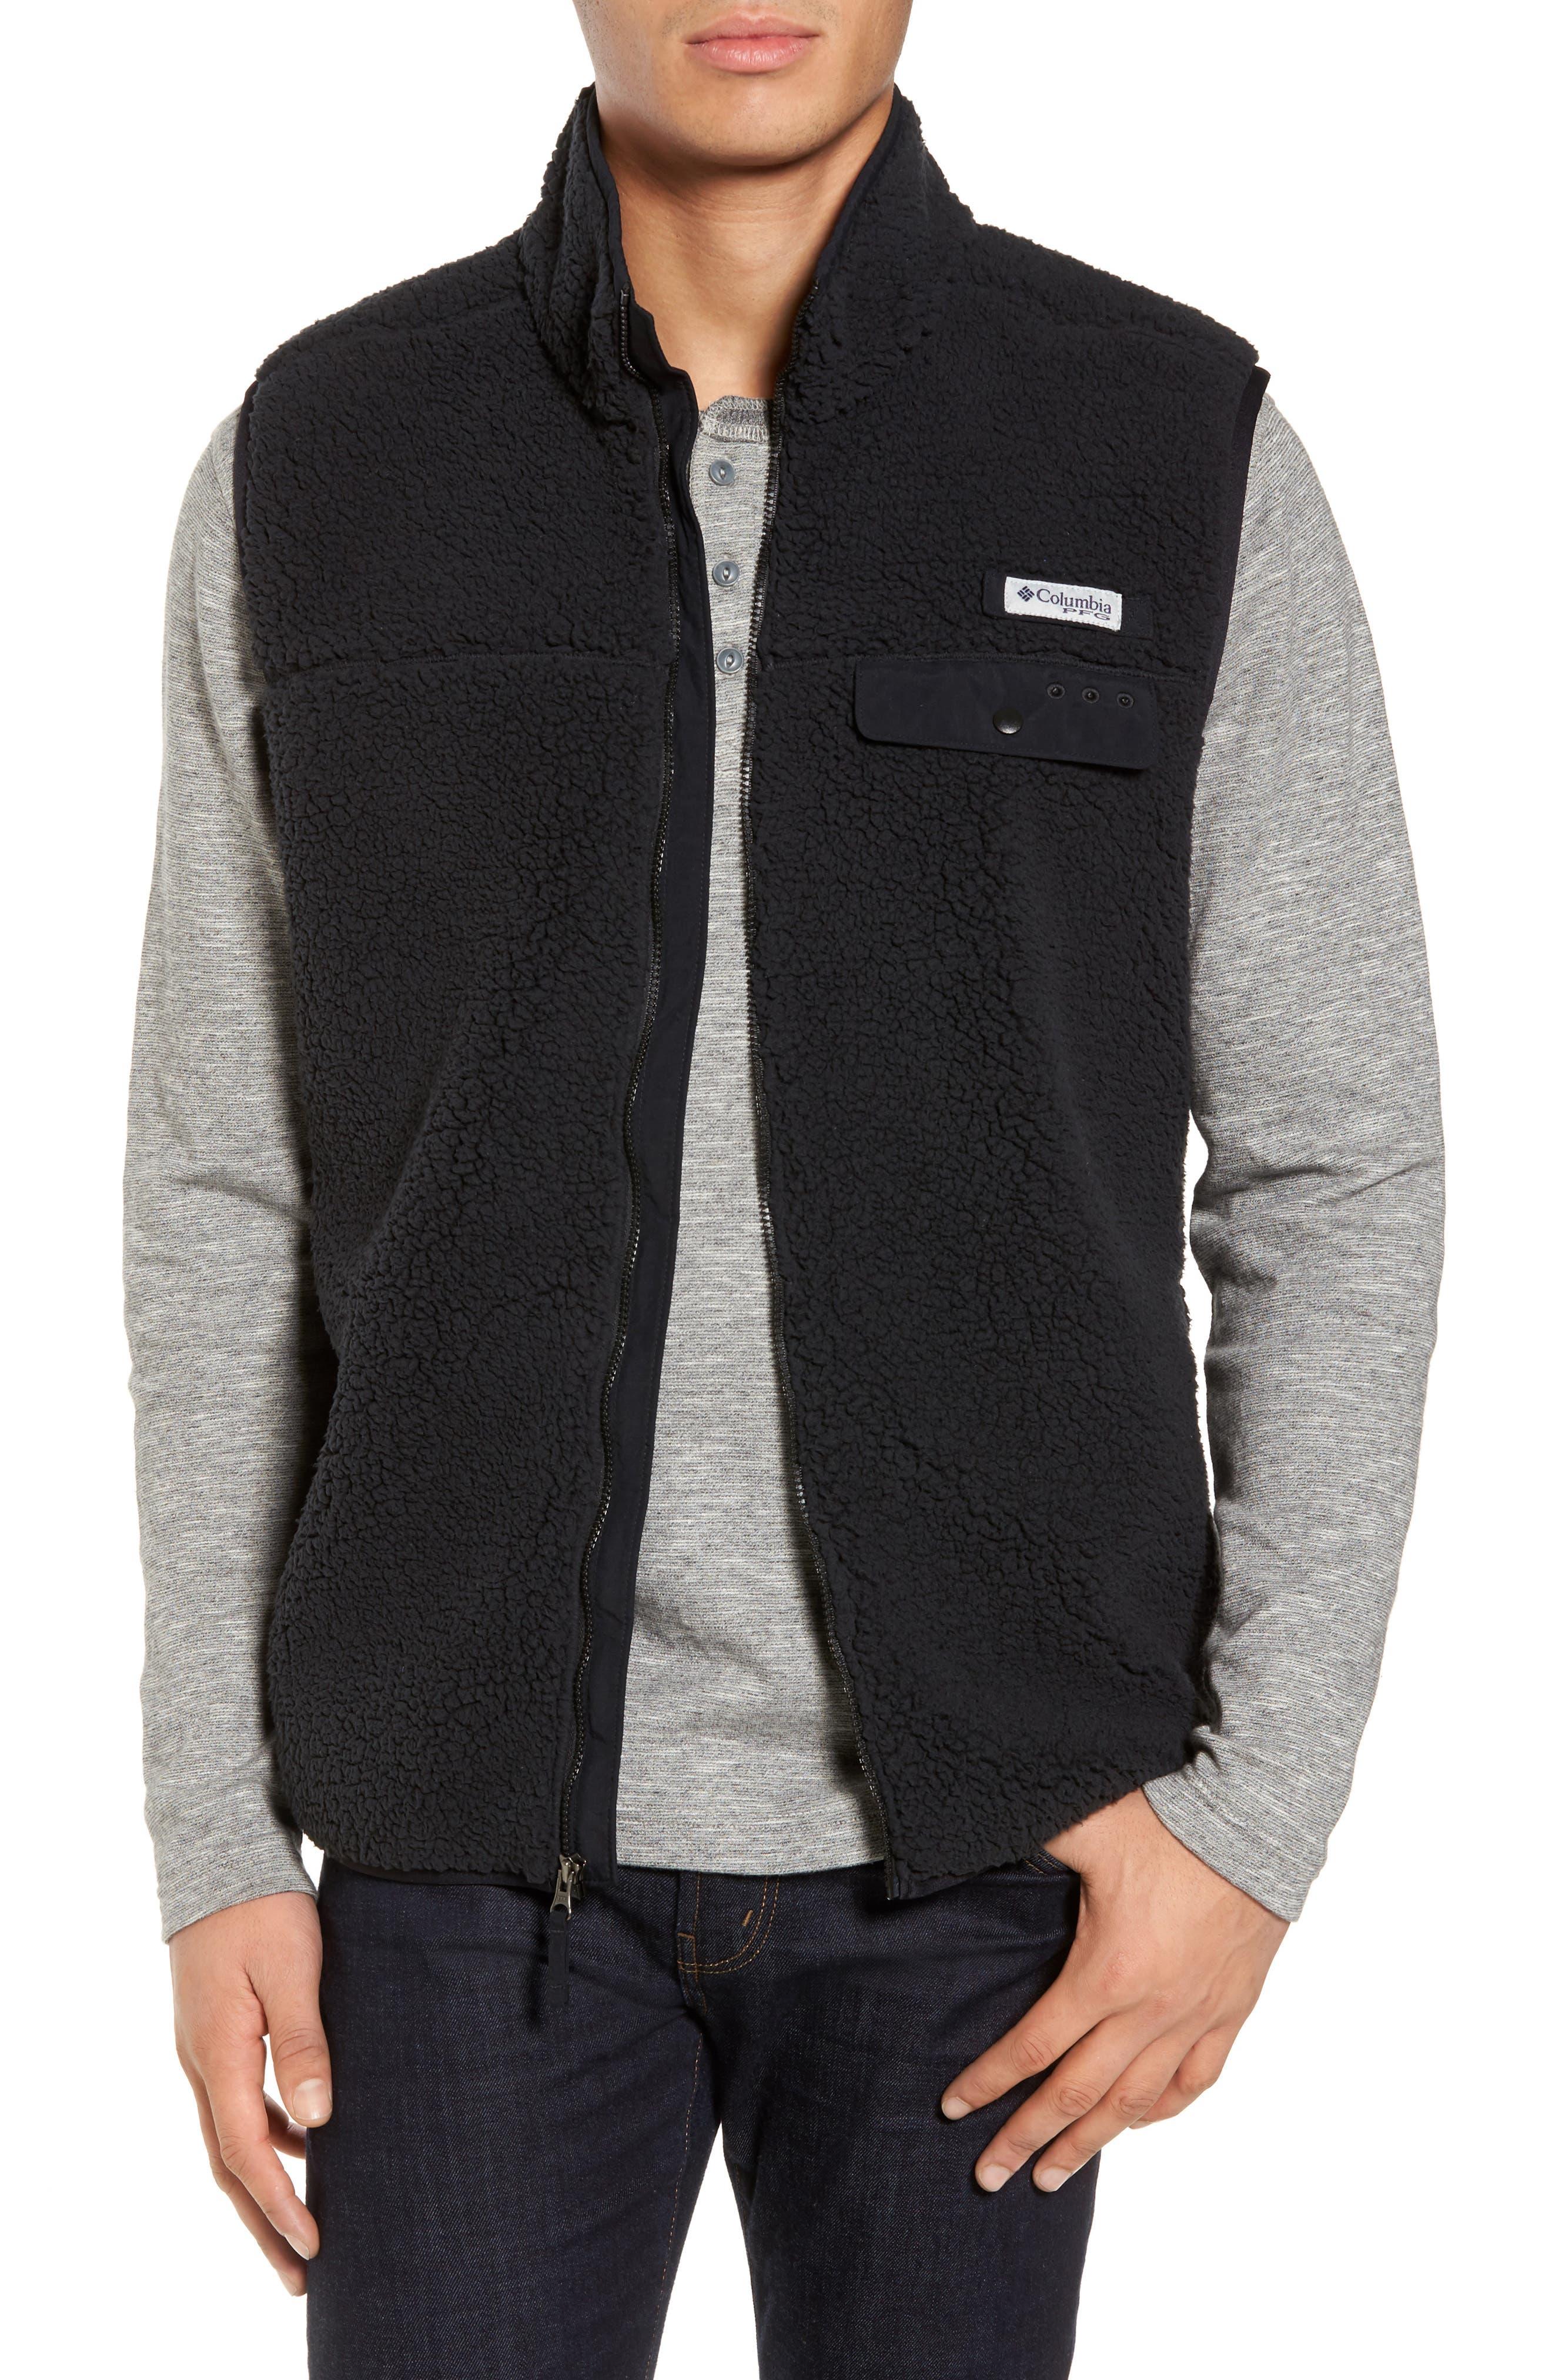 Sportswear Harborside Heavyweight Fleece Vest,                             Main thumbnail 1, color,                             010